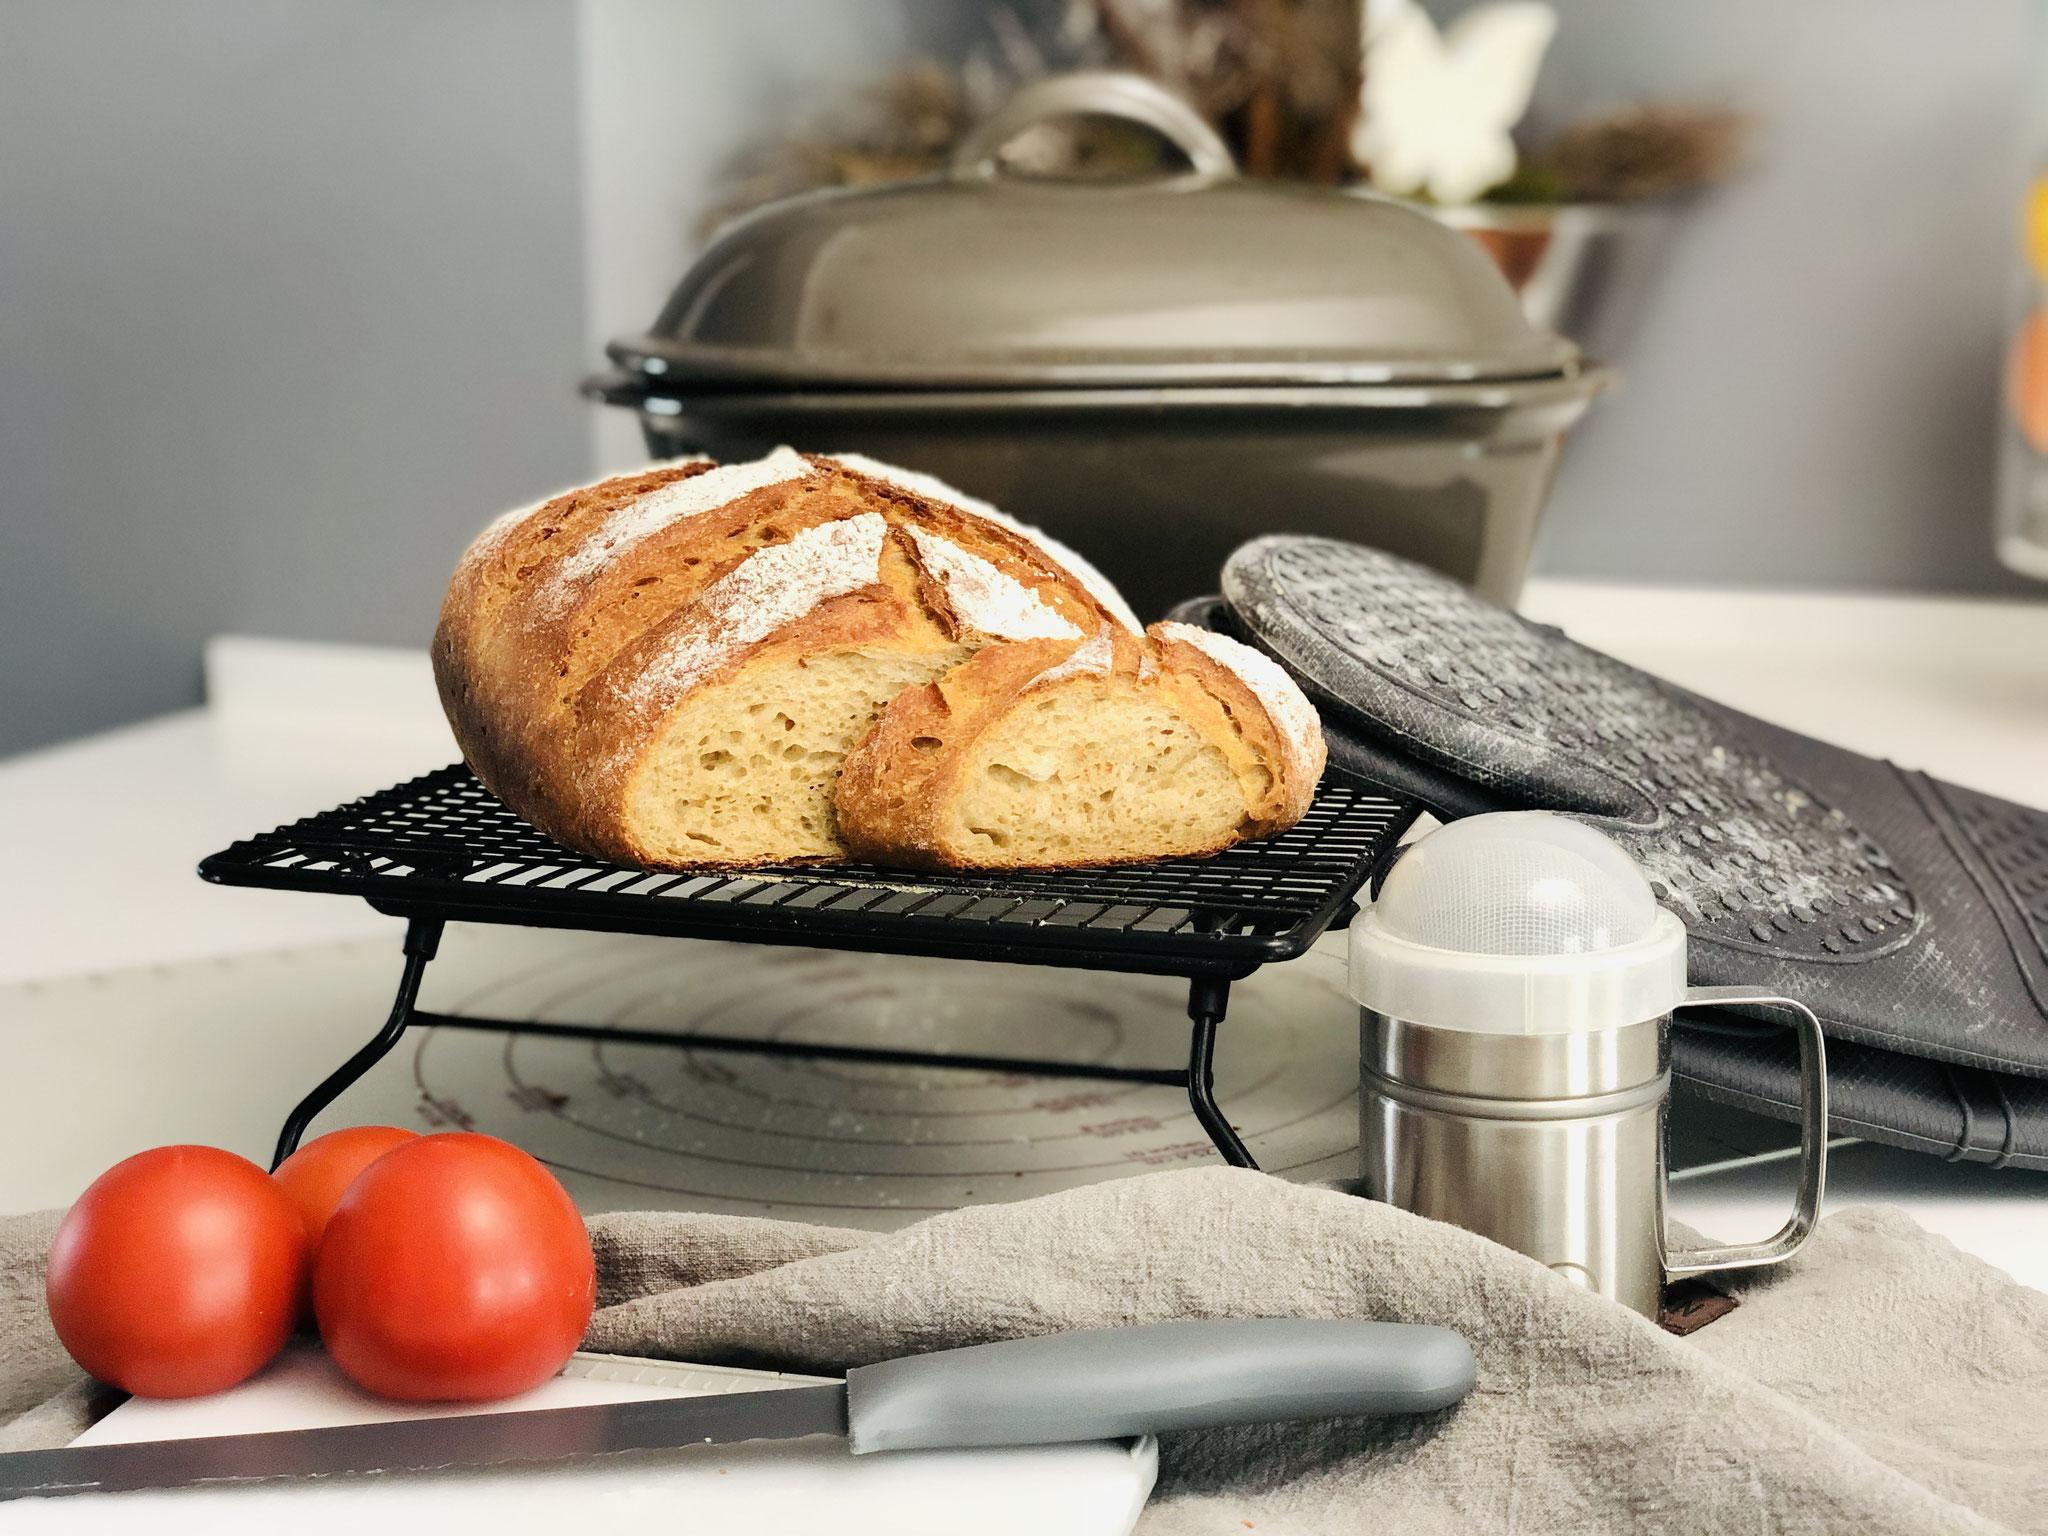 Hier siehst du den Anschnitt vom Brot - seeeehrrrr lecker :)